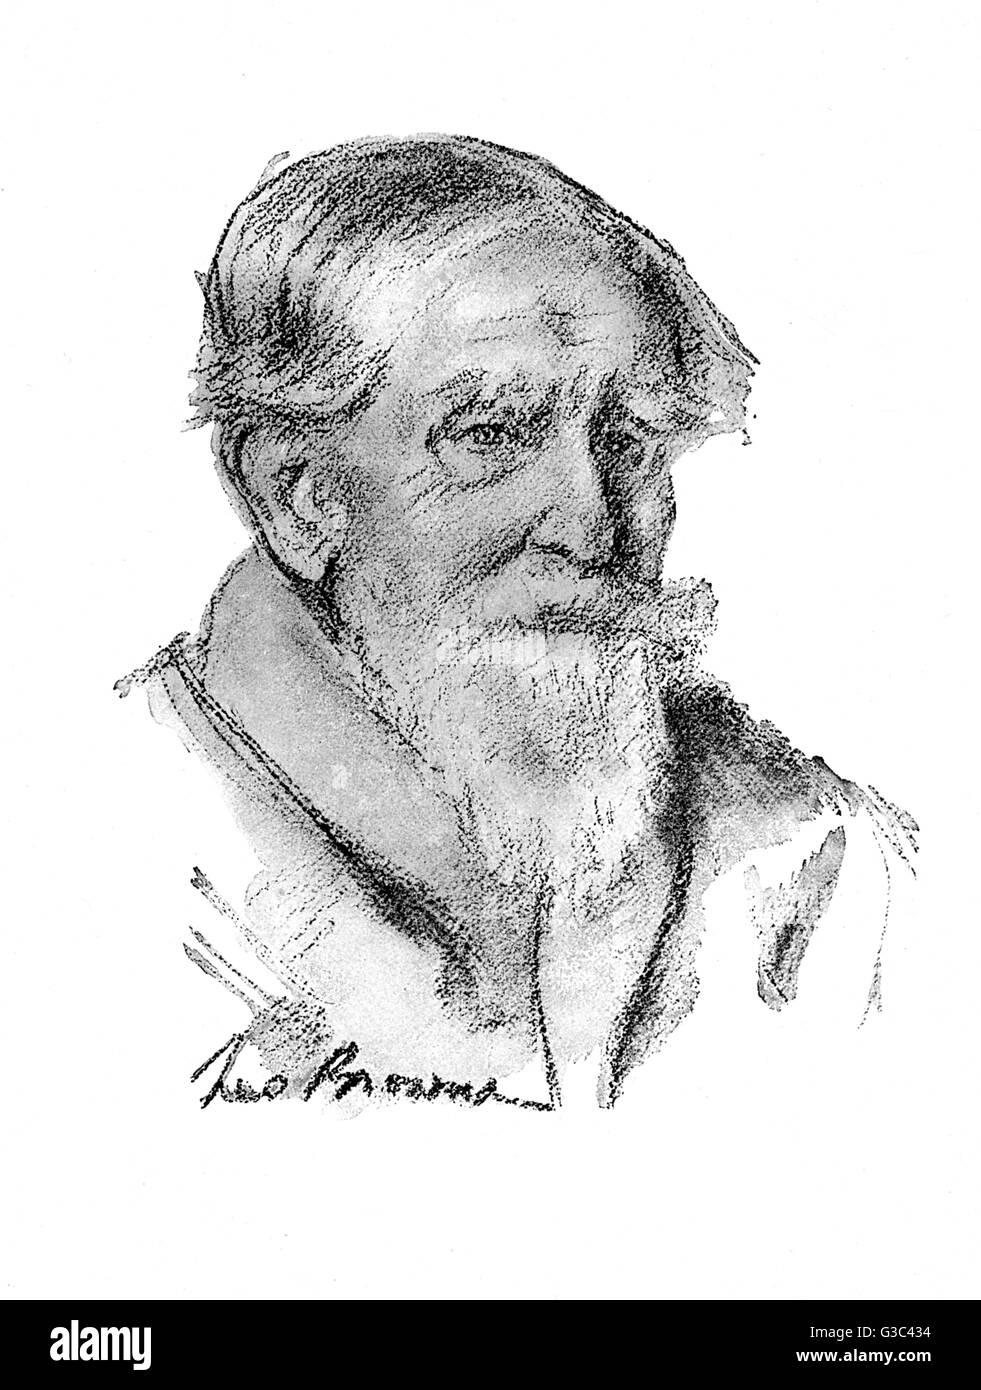 John Goodeve-Erskine, 27th Earl of Mar (1836-1930), Scottish aristocrat.      Date: 1925 - Stock Image